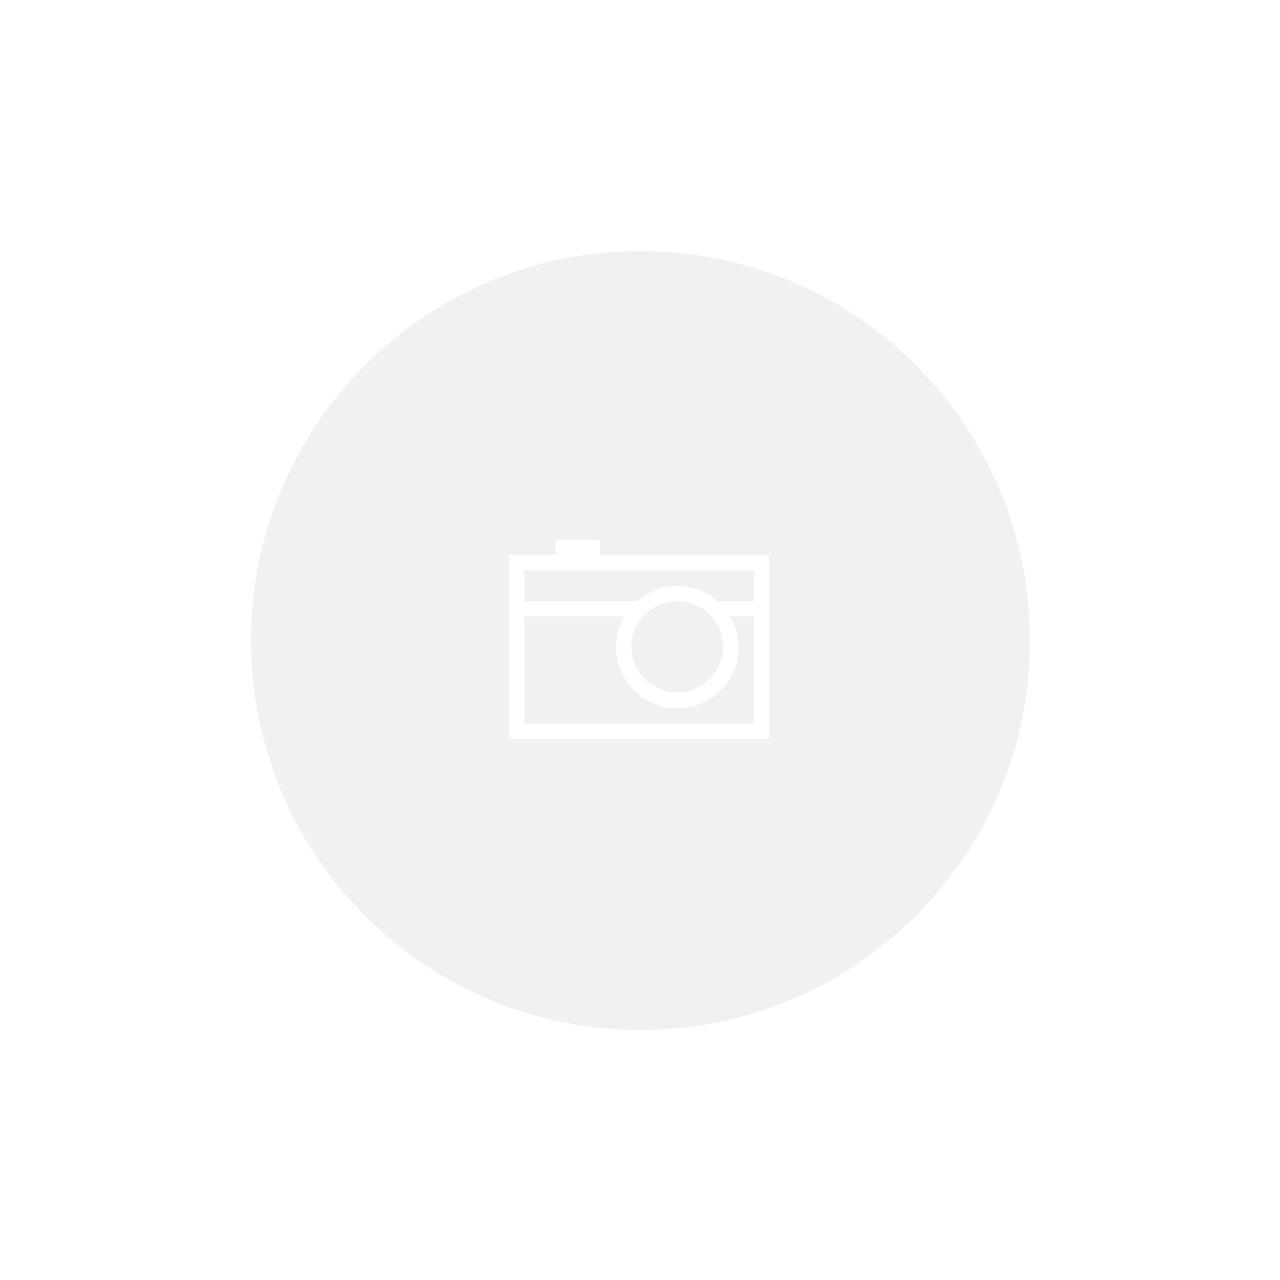 Pia Aco Inox 64X56 1ch 3f California Perfecta Tramontina